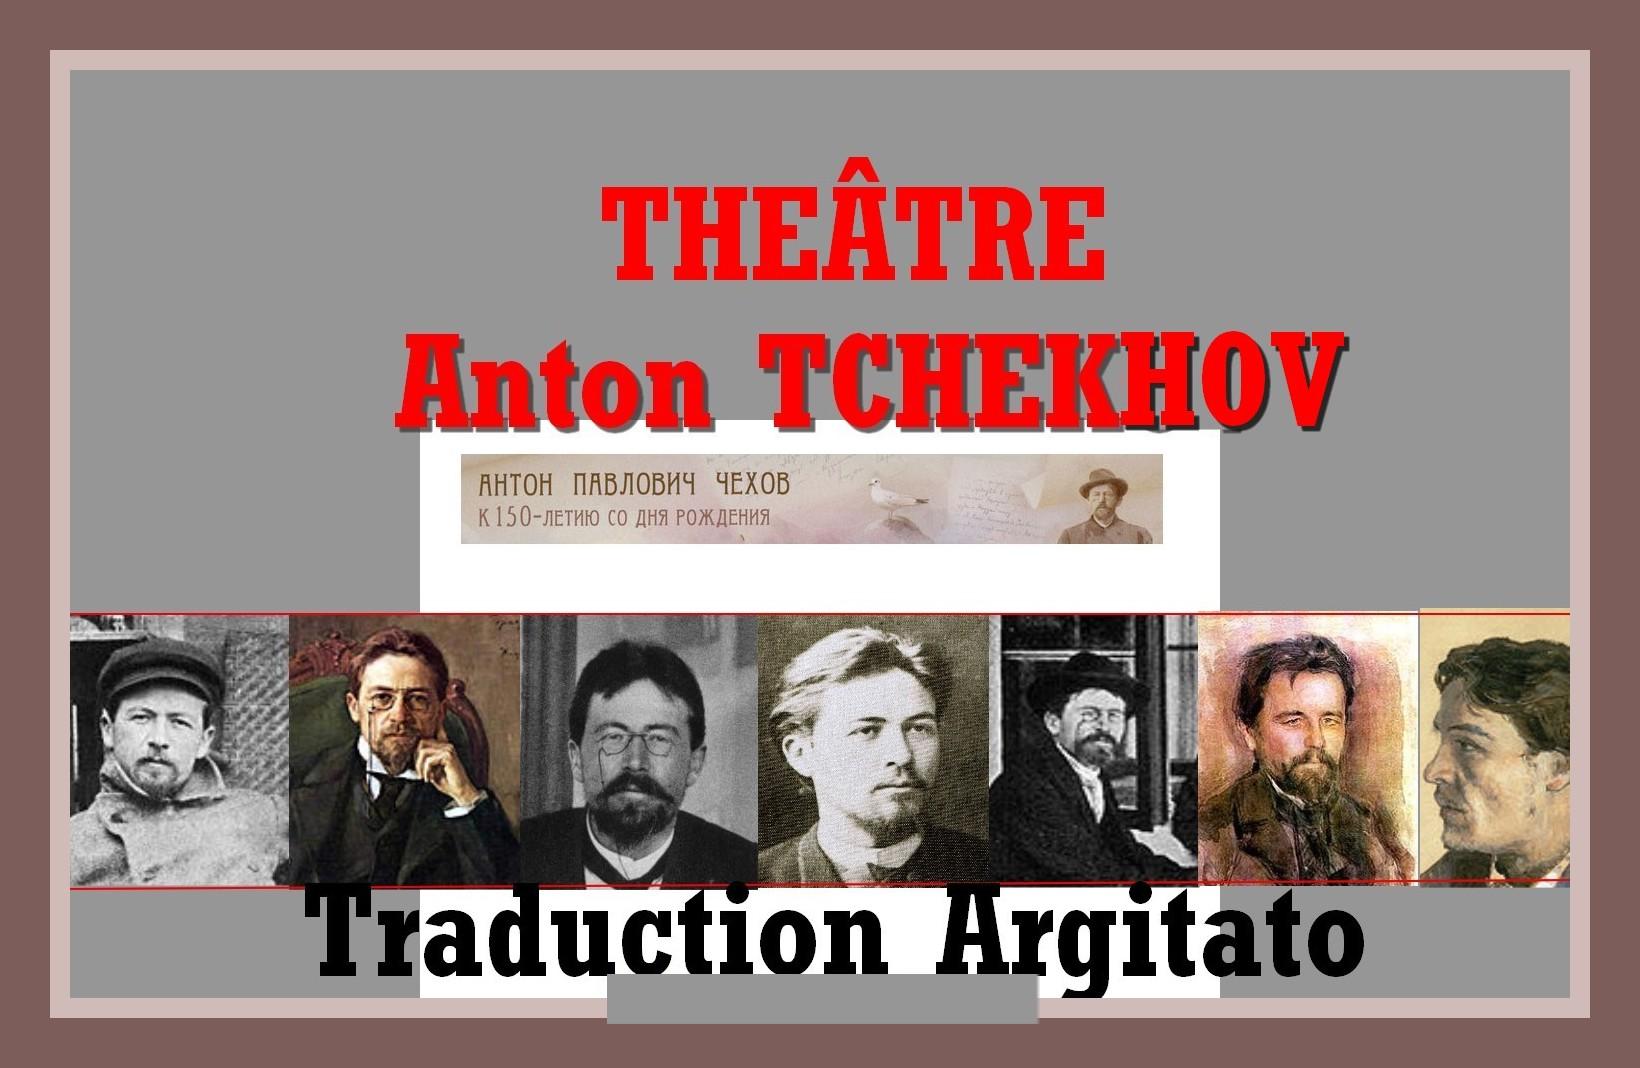 Tchekhov Artgitato Théâtre d'Anton Tchekhov